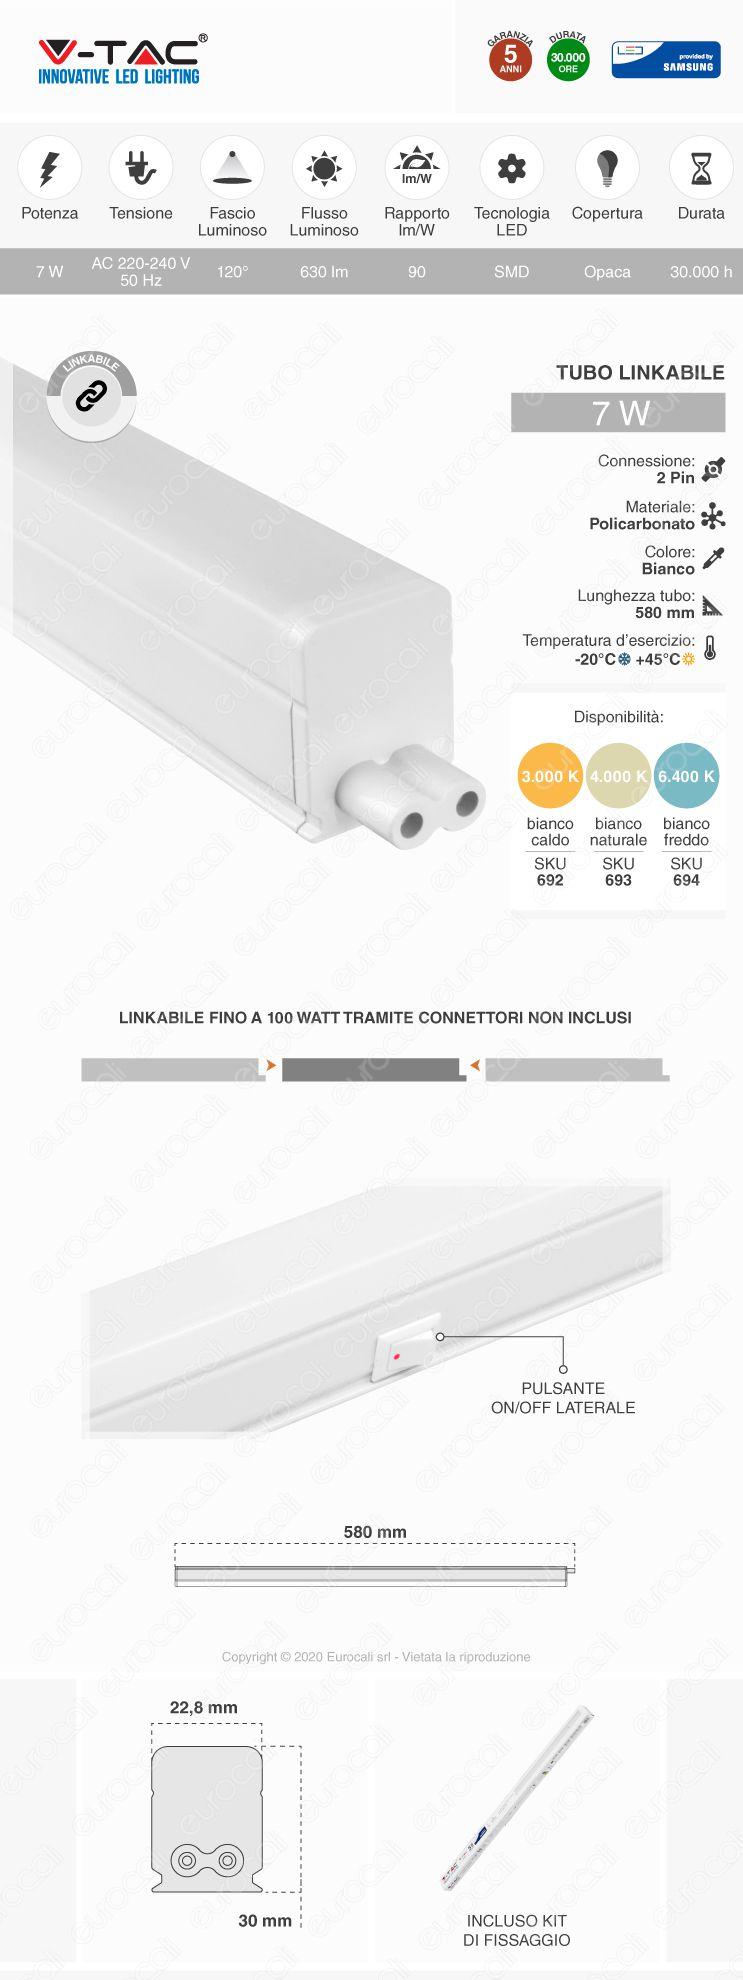 VT-065 V-Tac PRO Tubo LED T5 Chip Samsung Plafoniera Raccordabile 7W Lampadina 60cm